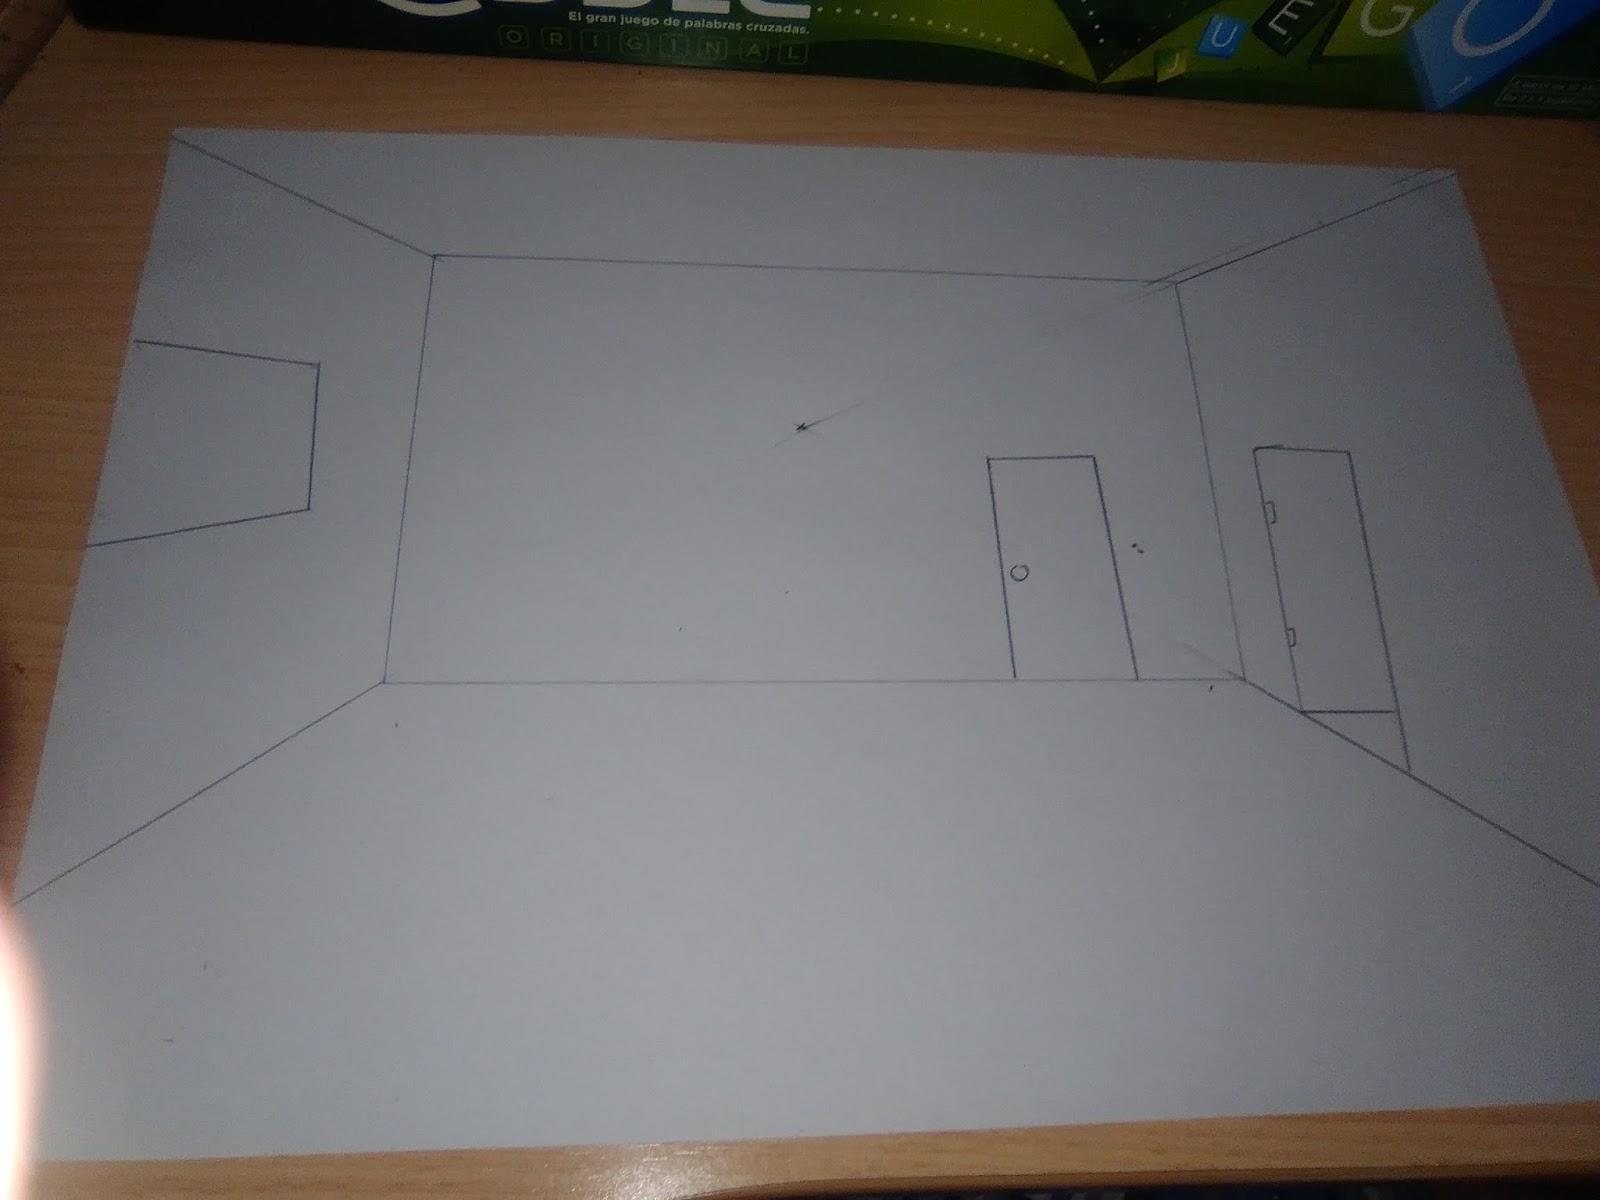 Dibujos De Aleix Como Dibujar La Perspectiva De Una Habitaci N